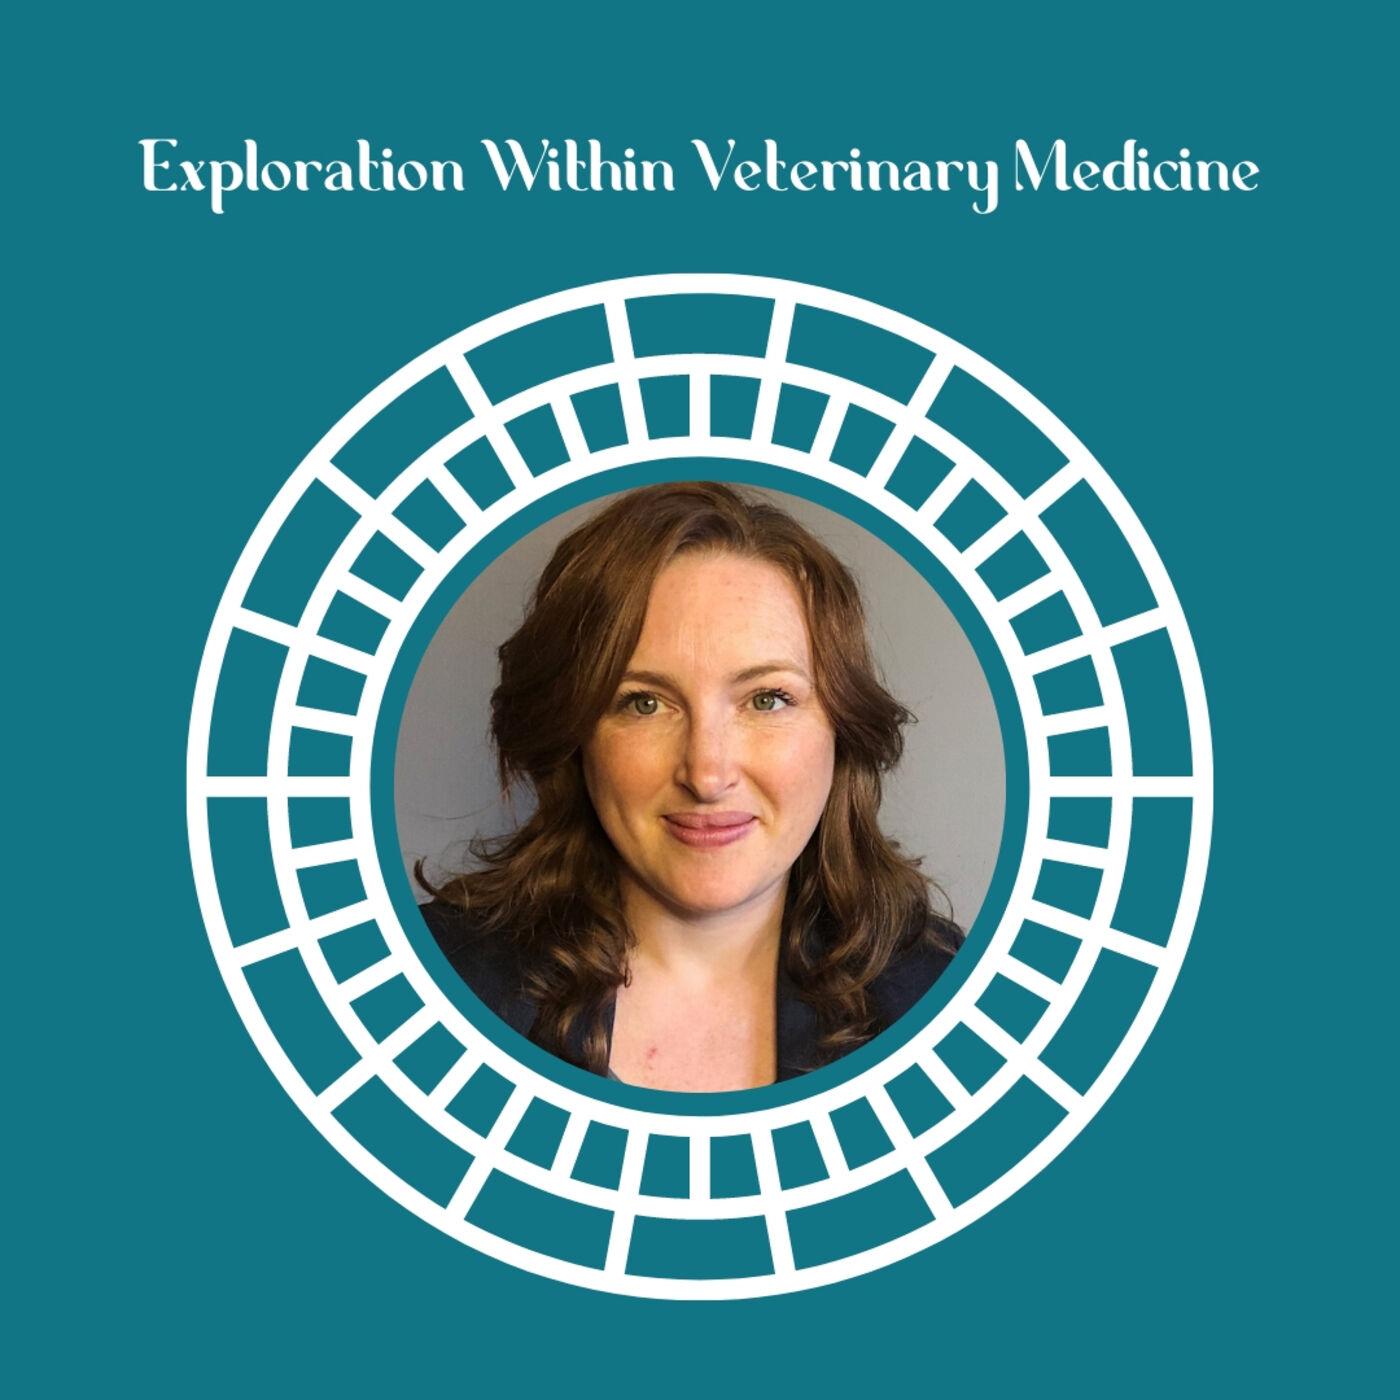 Exploration Within Veterinary Medicine with Dr. Melanie Barham